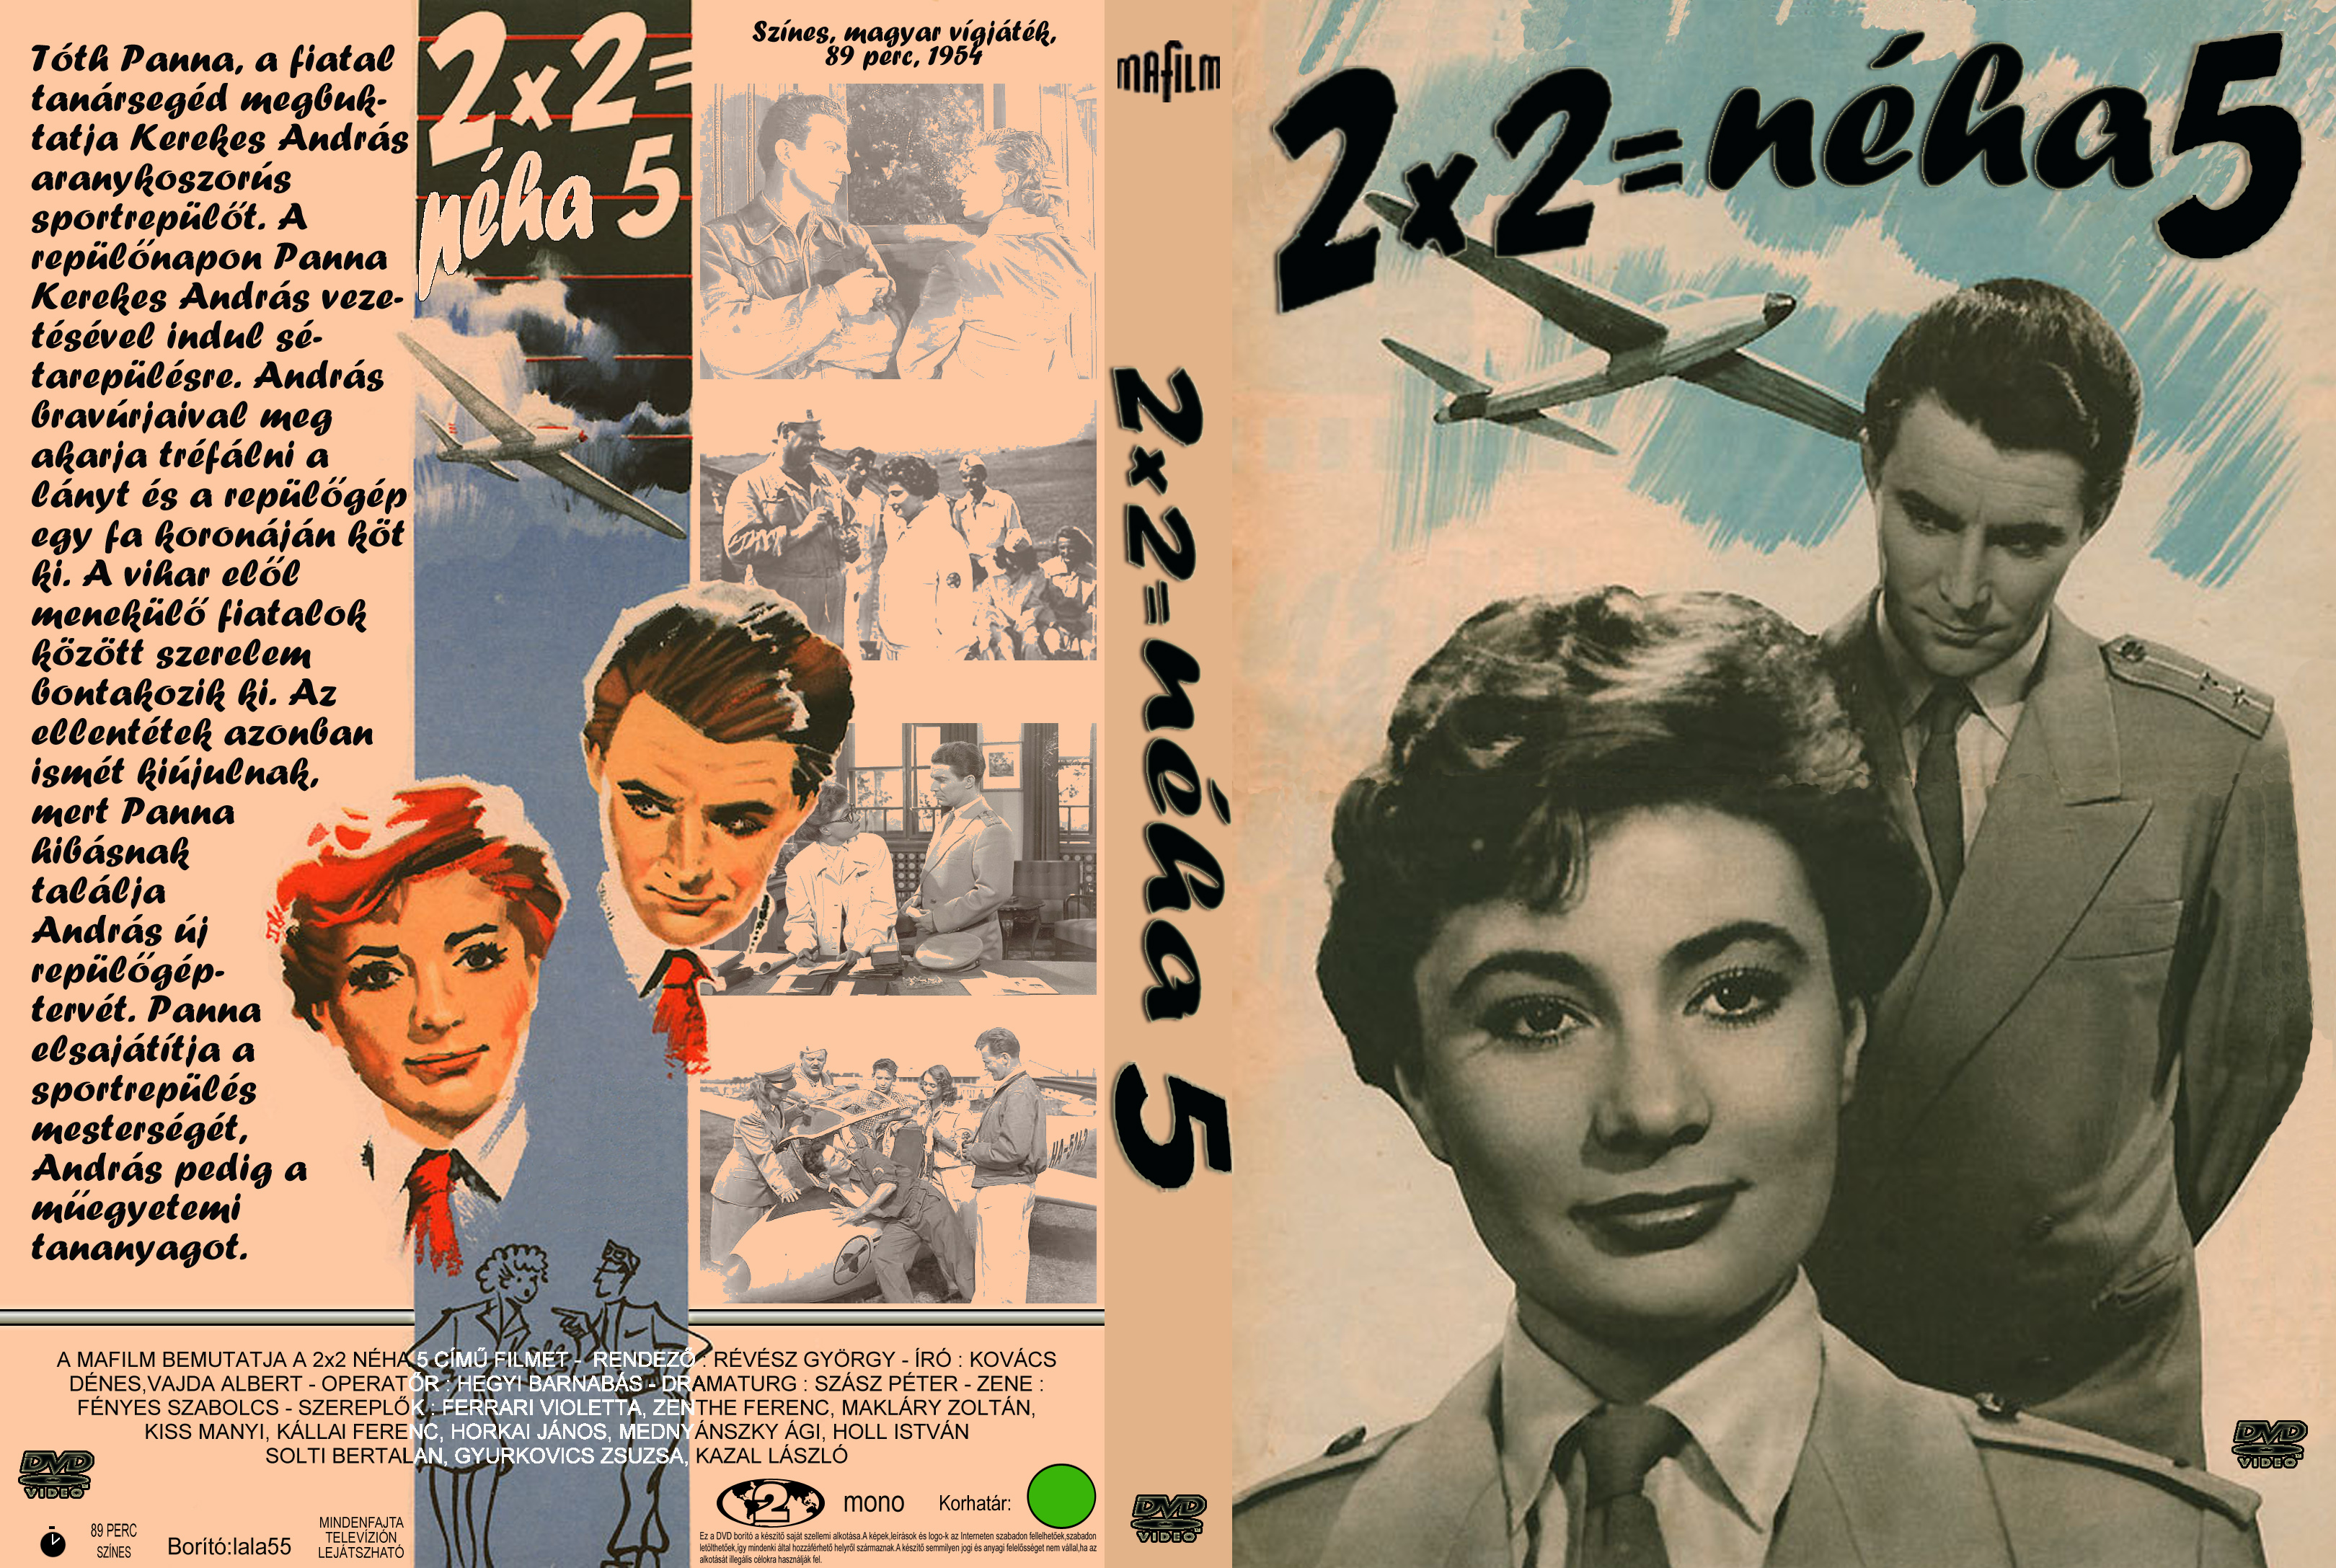 2x2_neha_5_lala55_front_coversclub.jpg